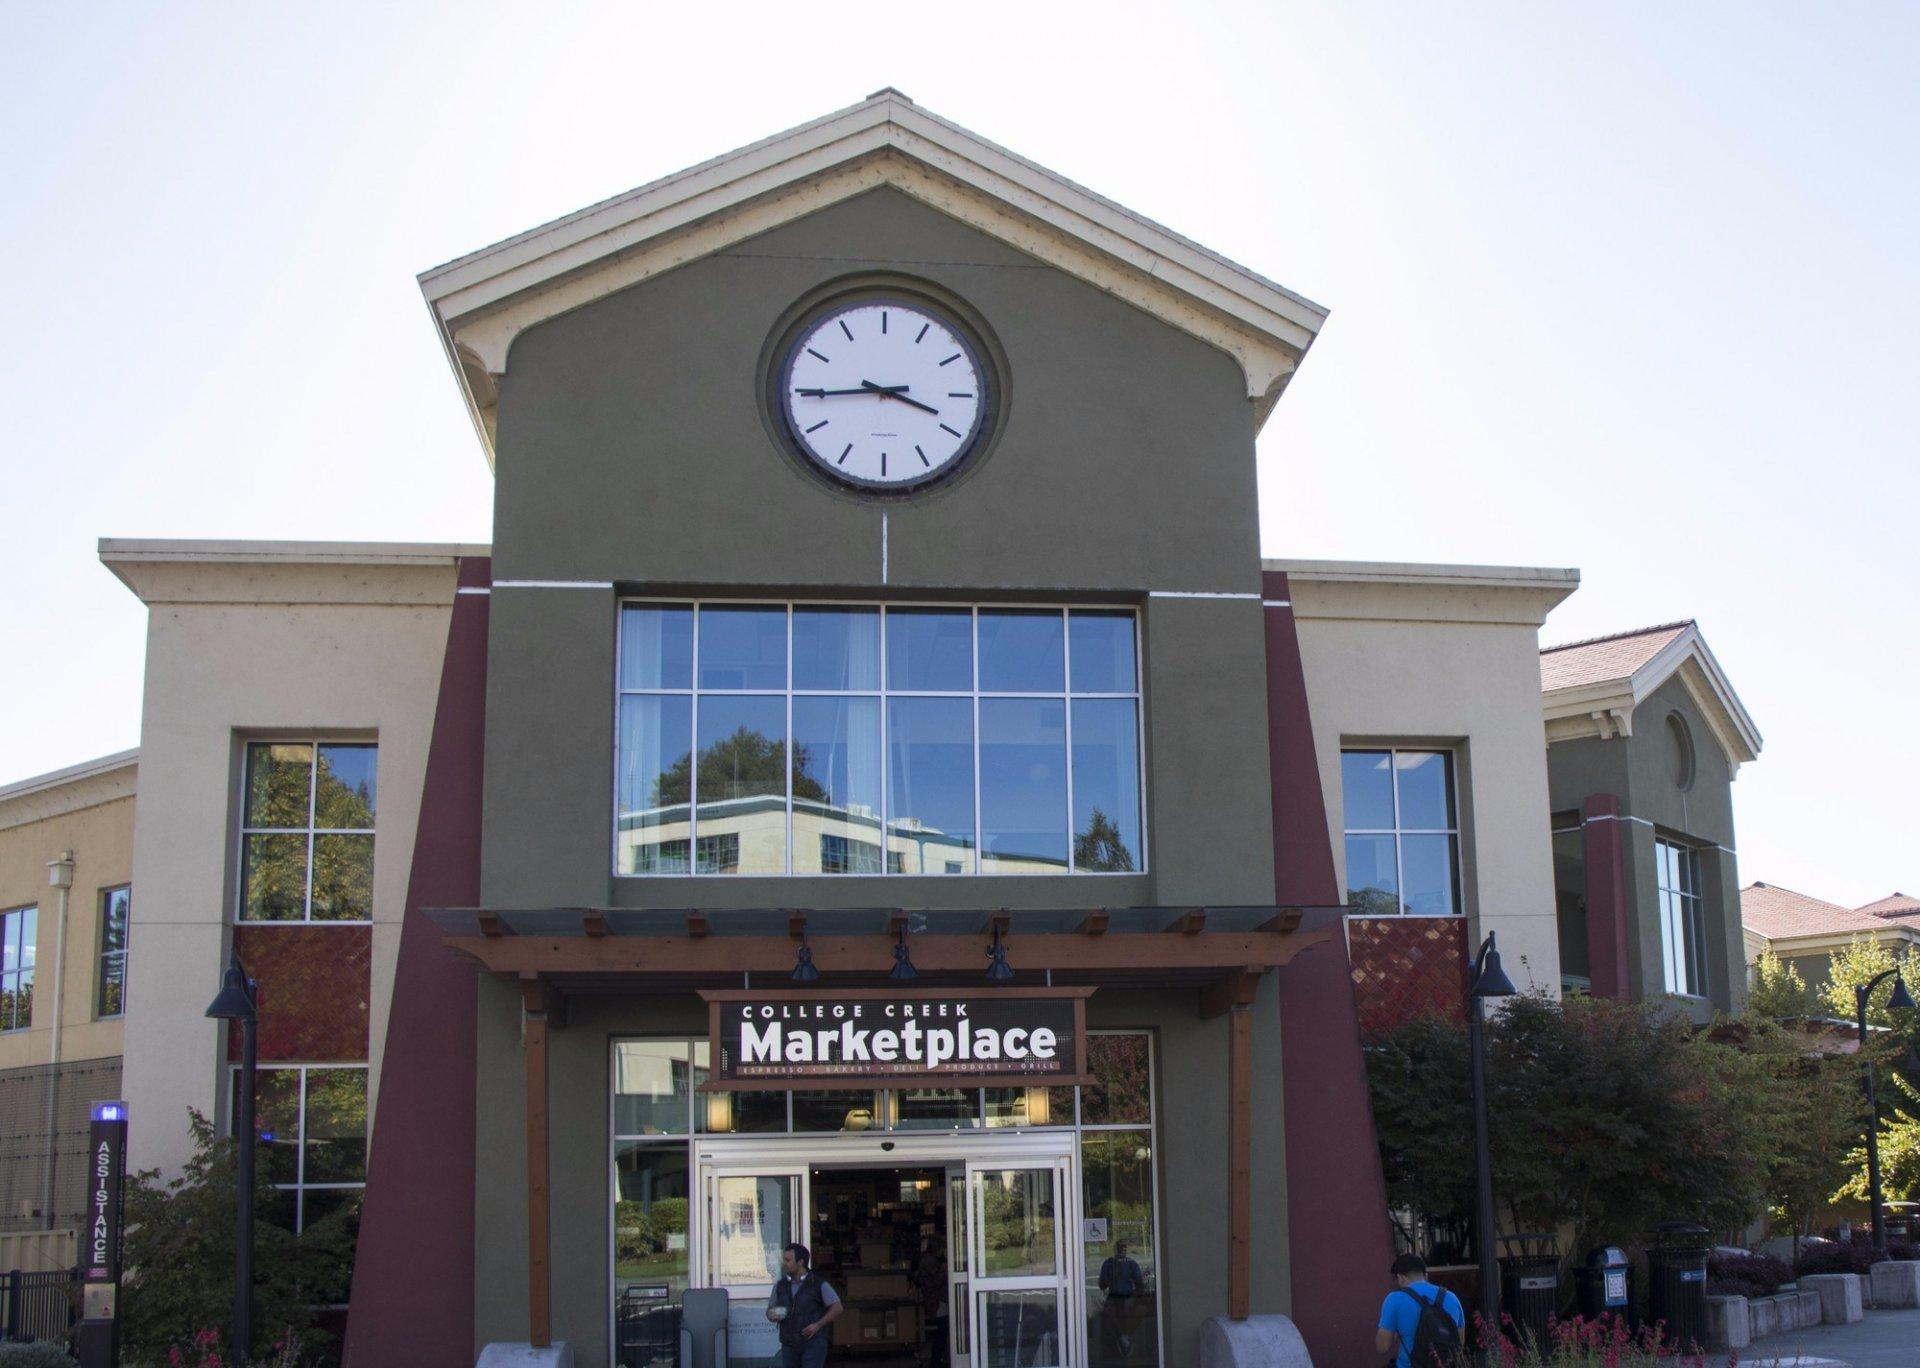 The Marketplace at HSU Photo credit: Curran C. Daly